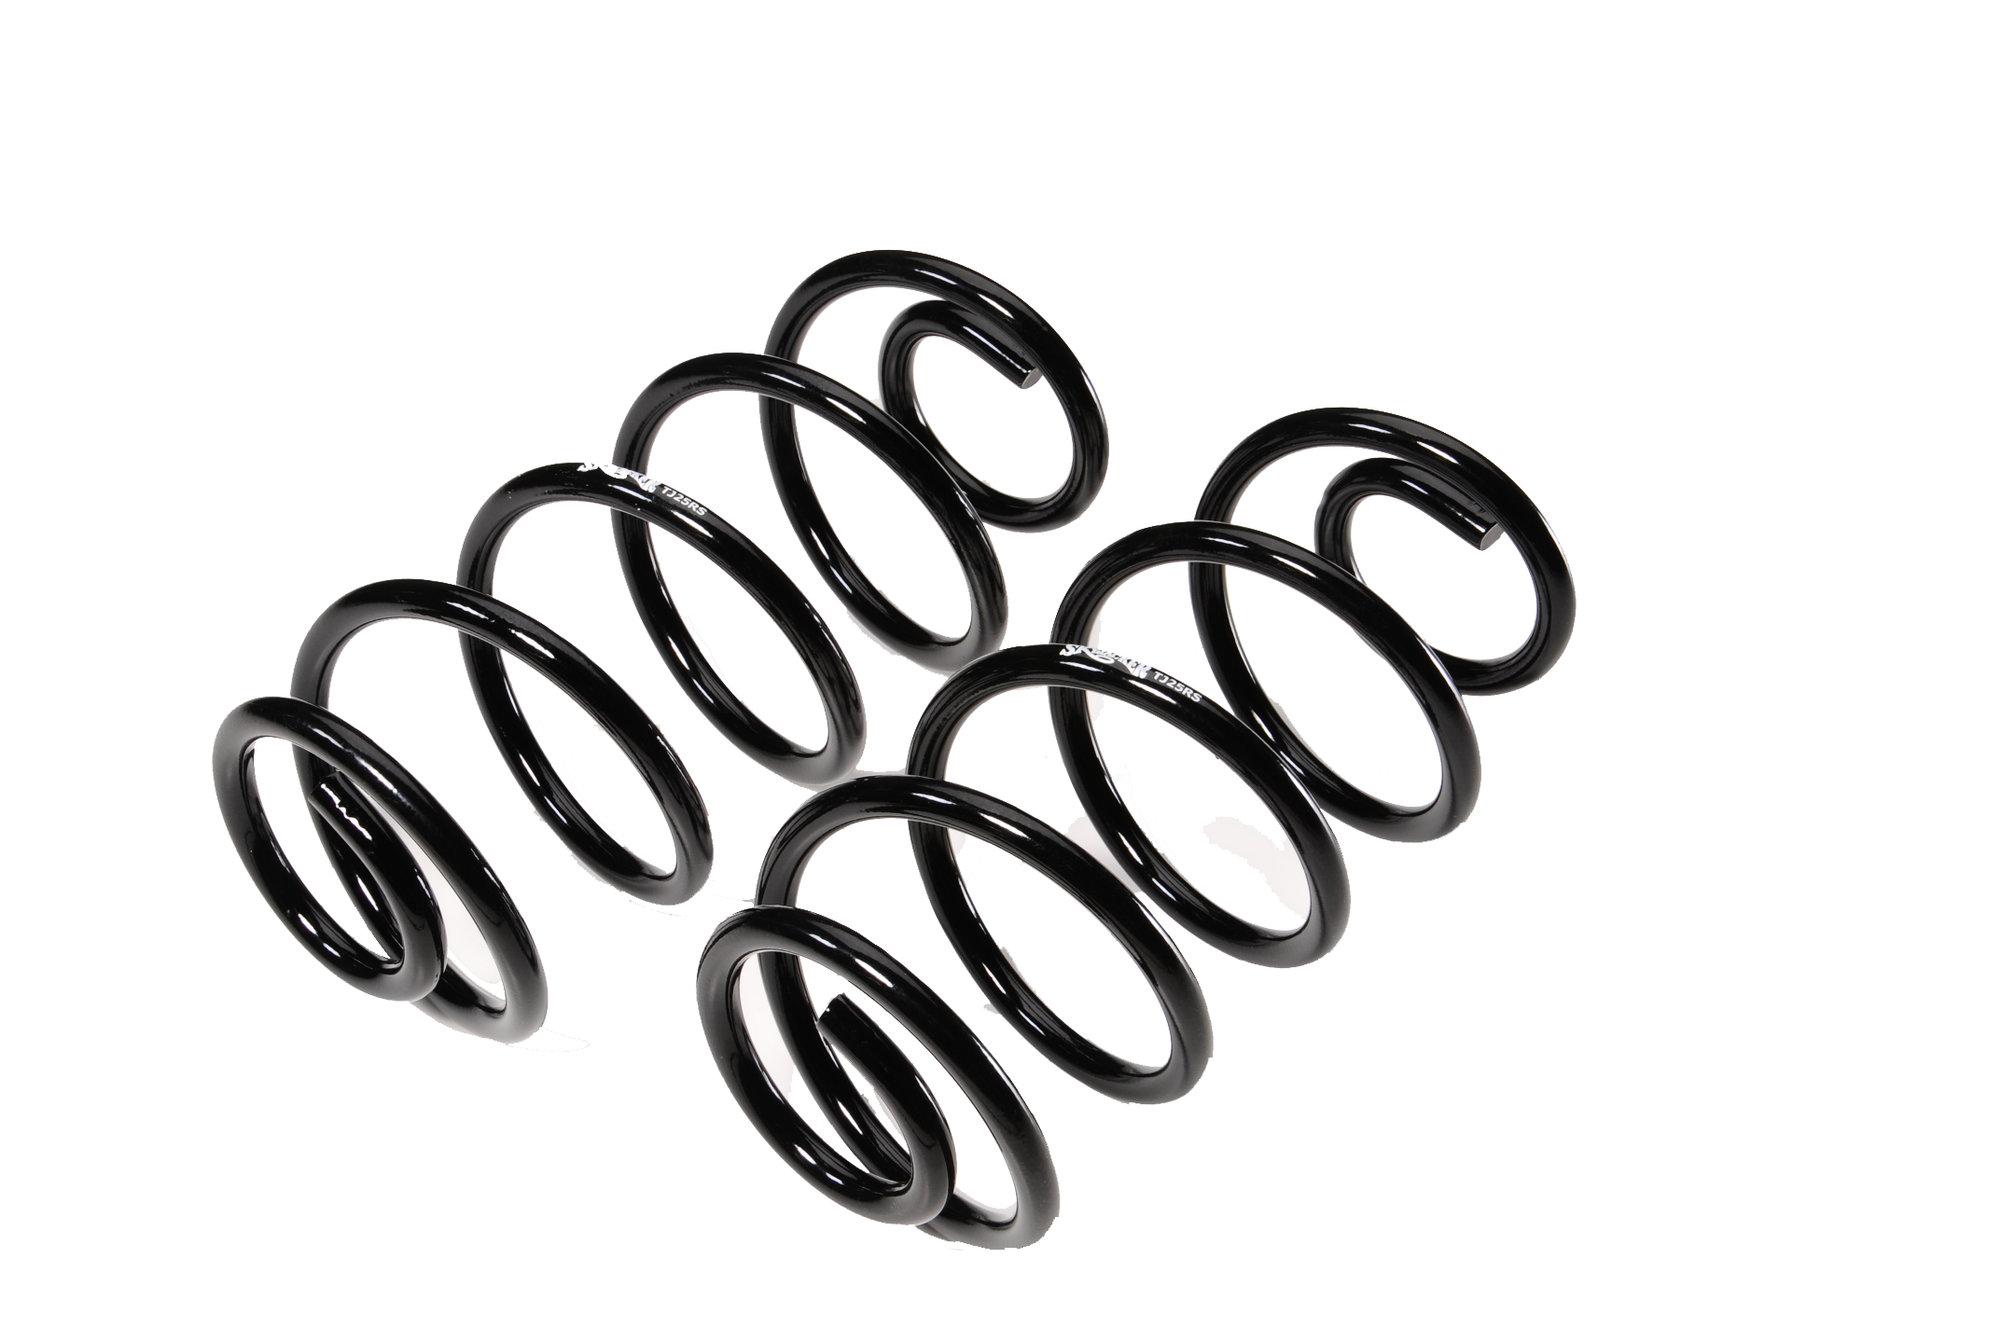 2000x1328 skyjacker tj25r rear coil springs for 97 06 jeep wrangler tj with